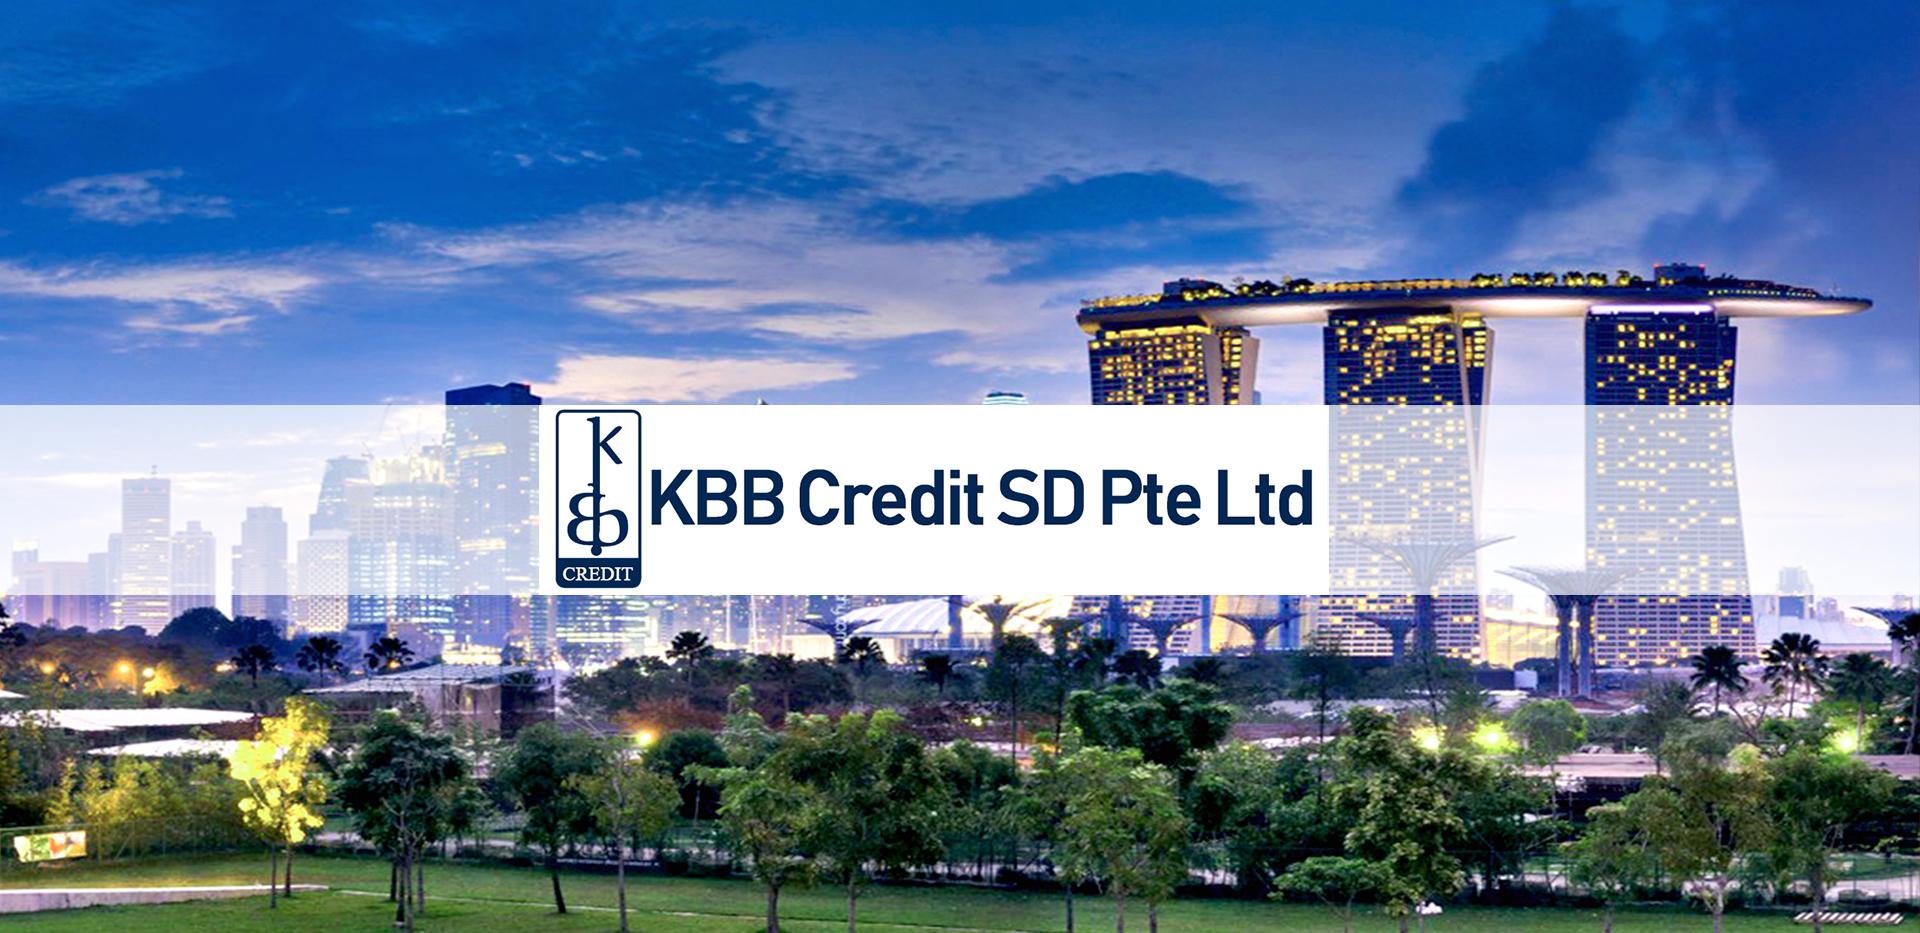 sgwithlogo kbb-credit-sd-pte-ltd